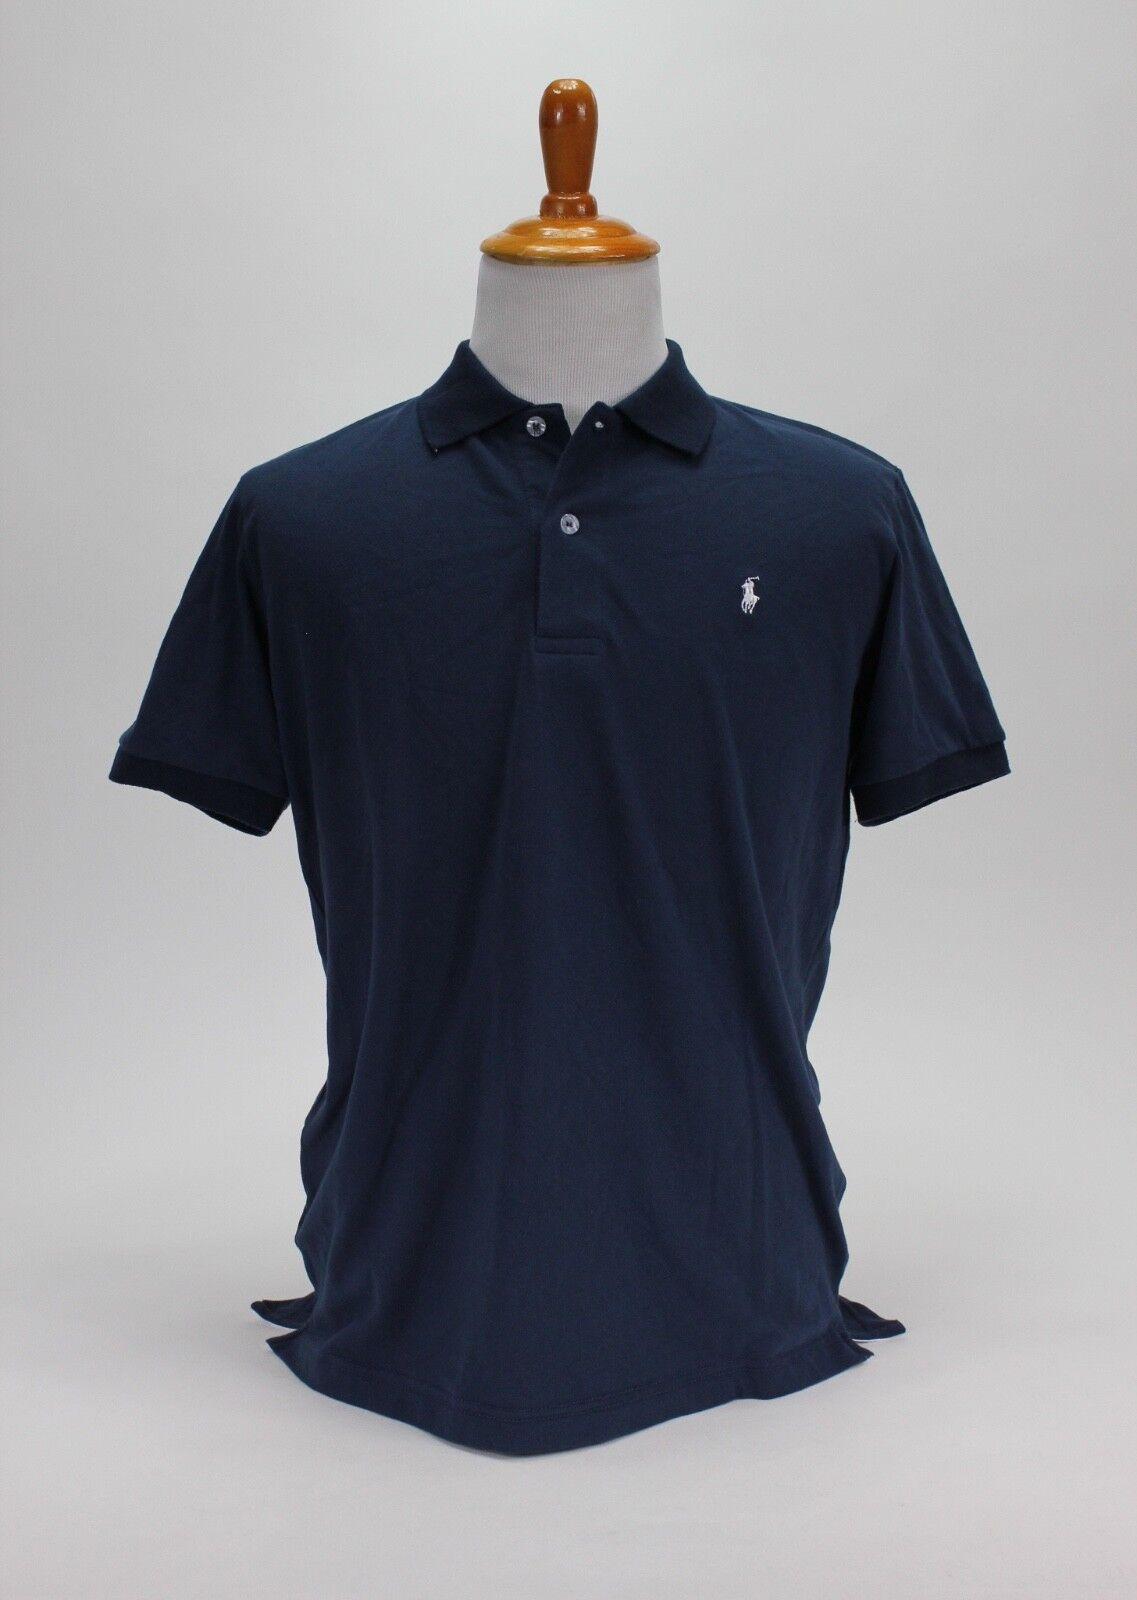 Polo Ralph Lauren Men's Classic-Fit NZD Polo Shirt bluee Size XL 100% Cotton